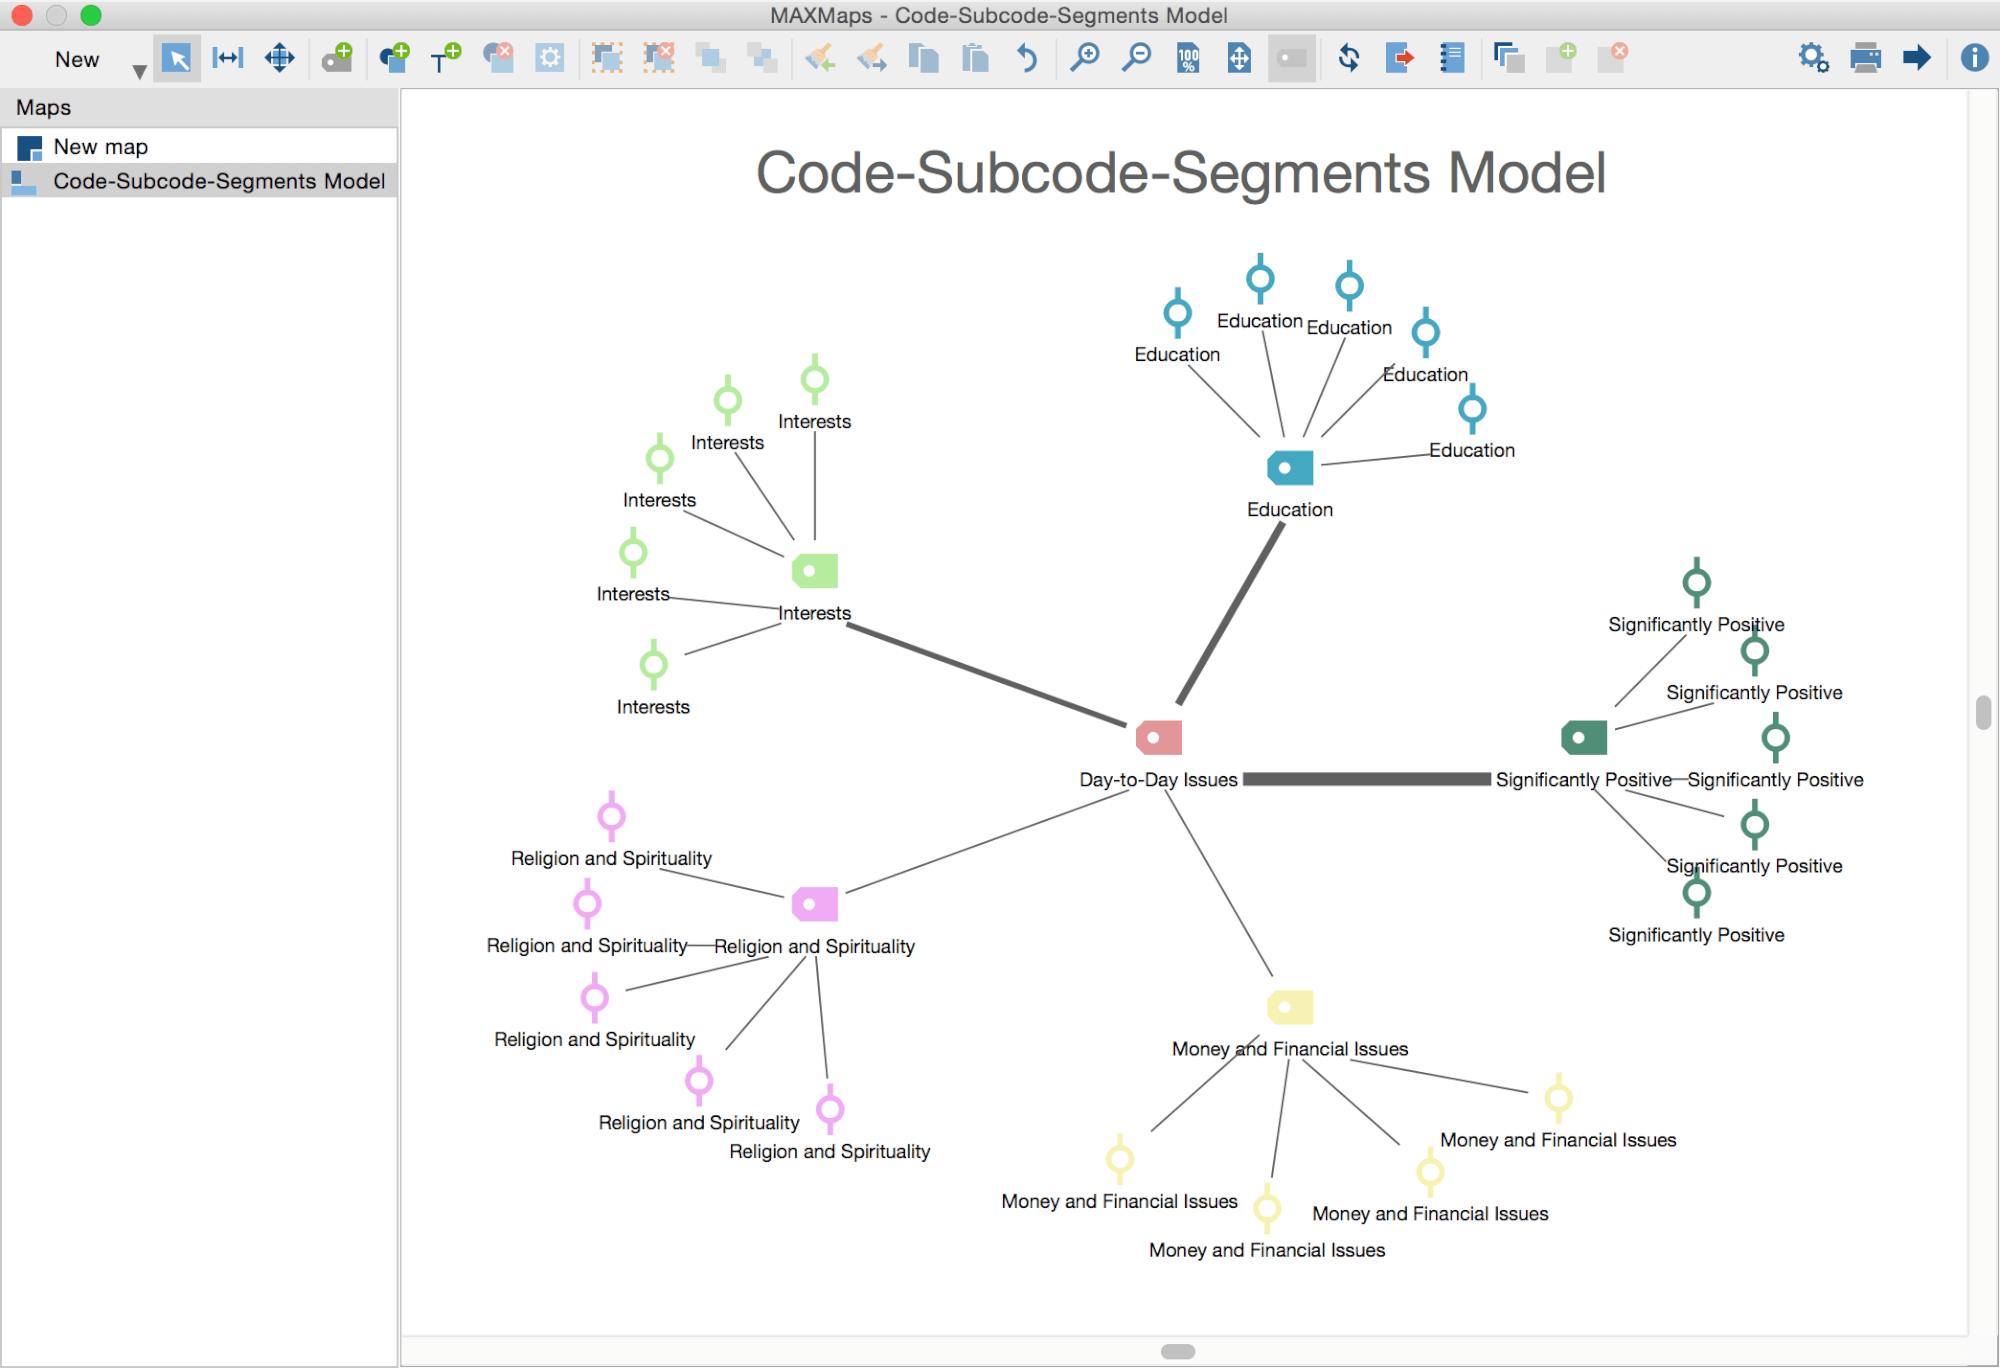 Code-subcodes-segments Model